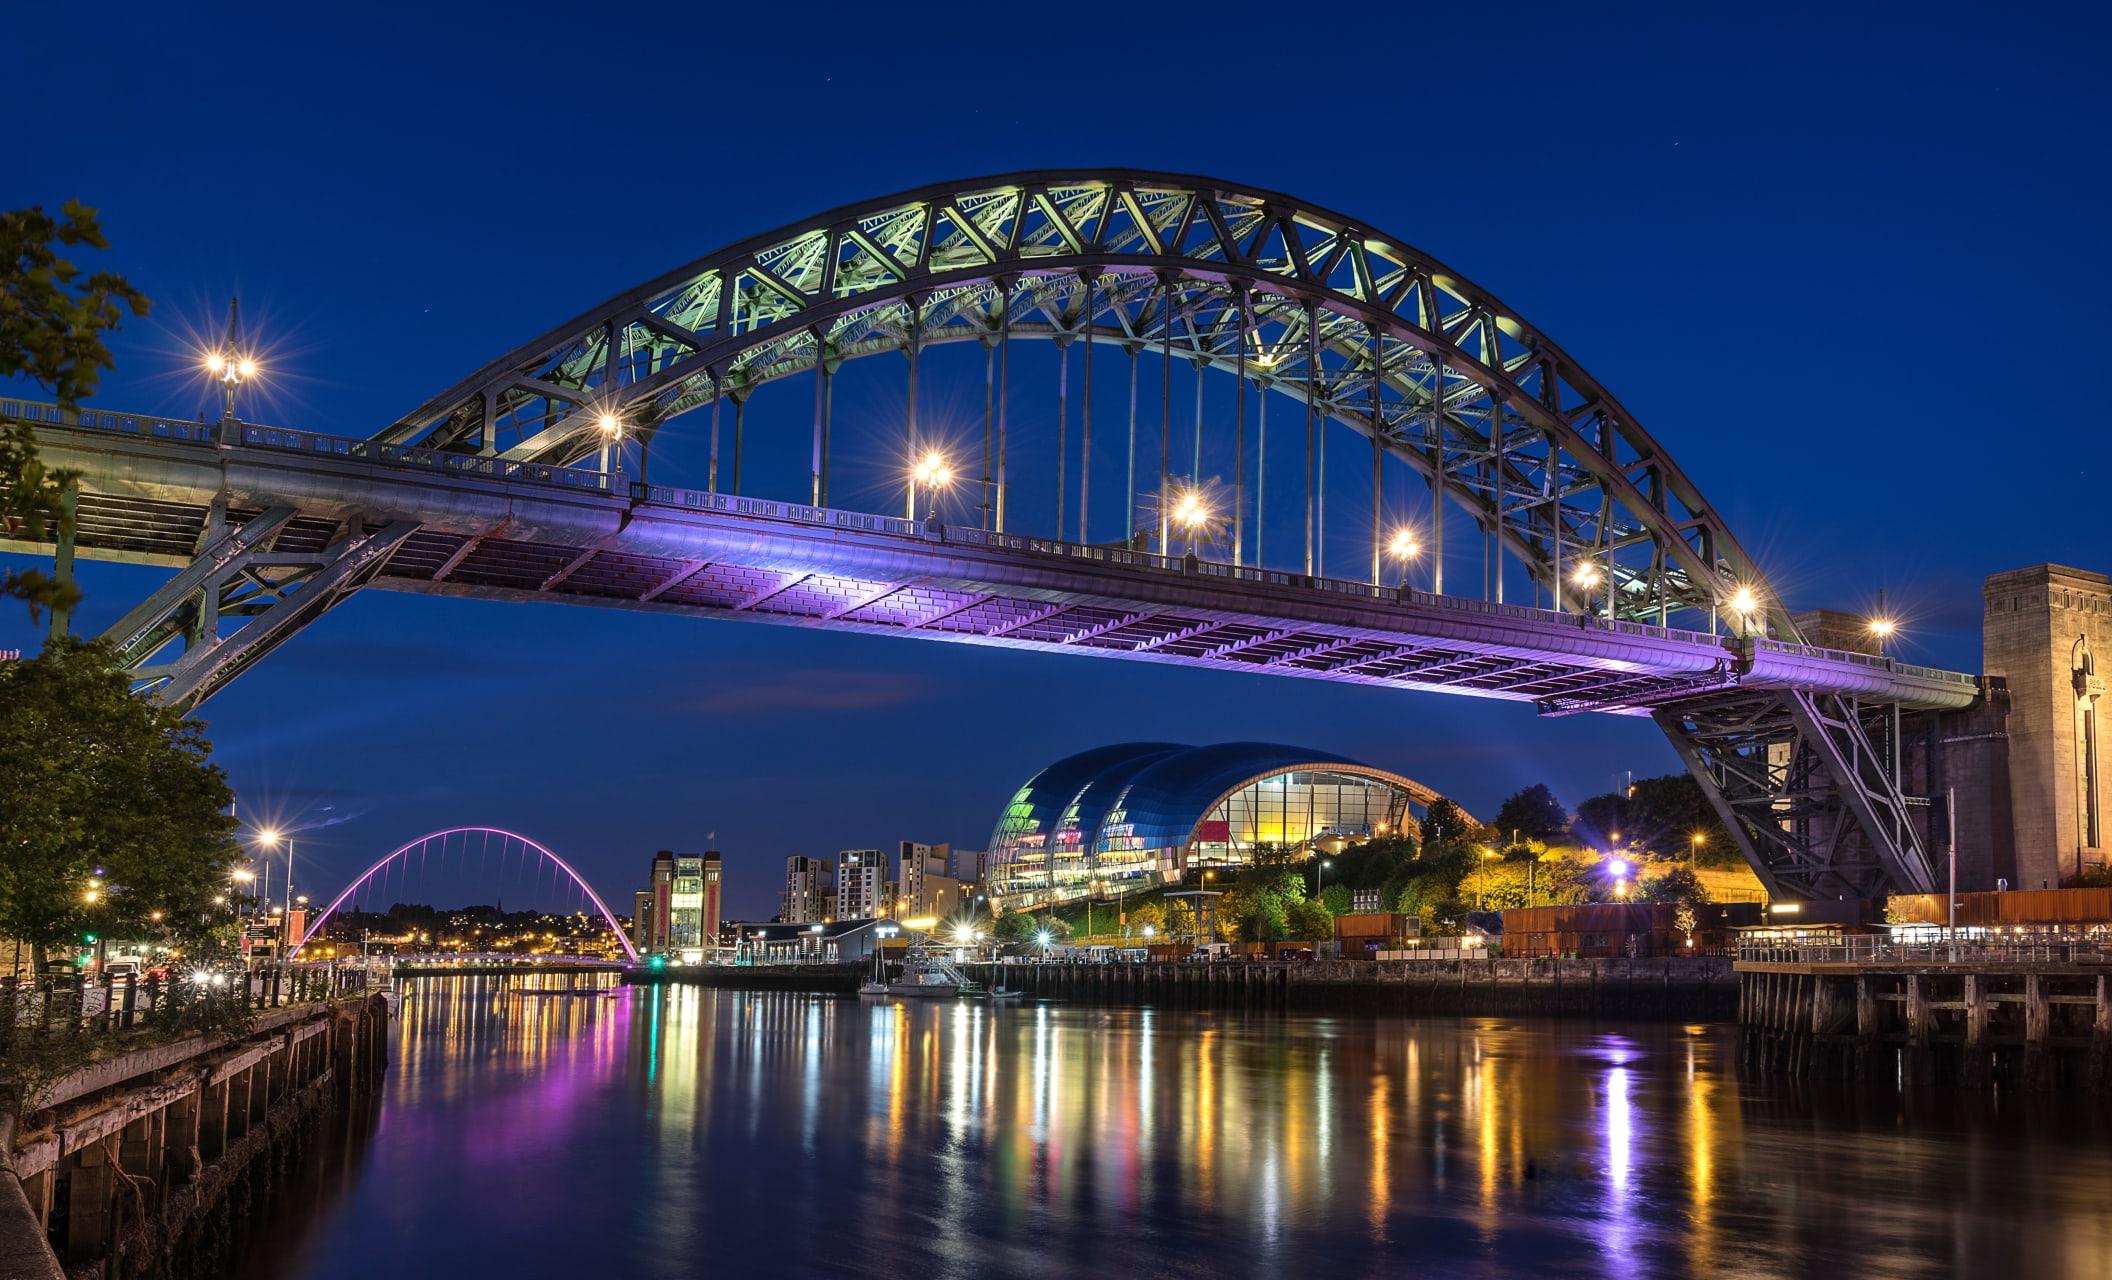 Newcastle - Once Upon a Tyne